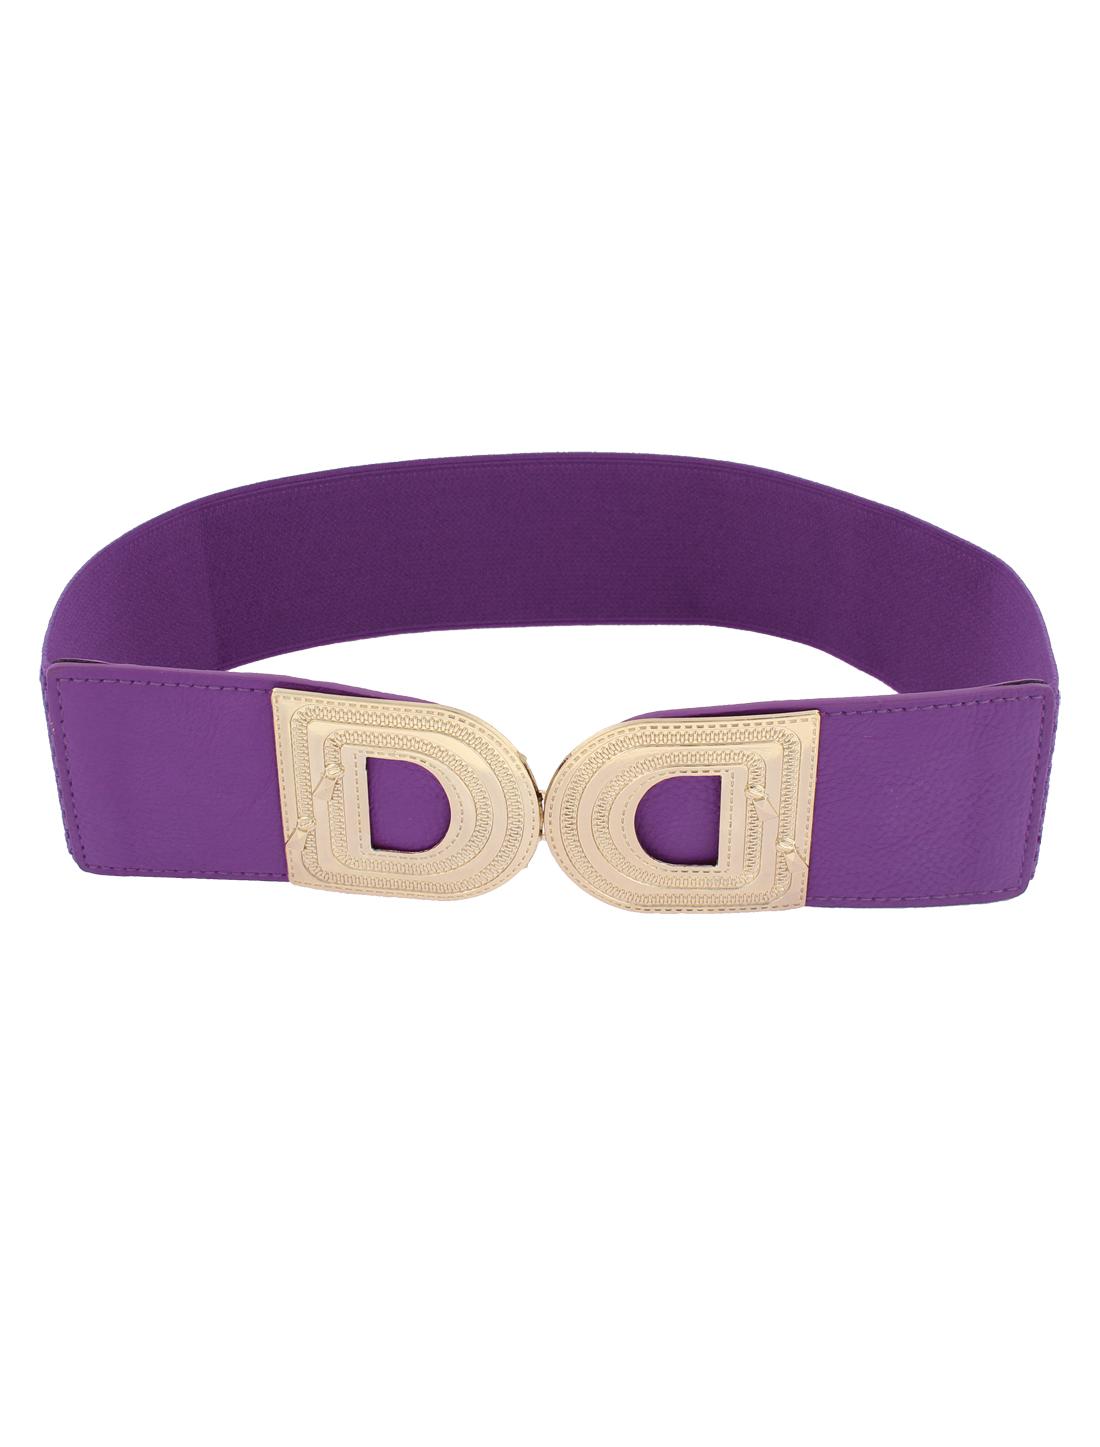 Metal Buckle Adjustable Elastic Wide Waistband Waist Belt Purple